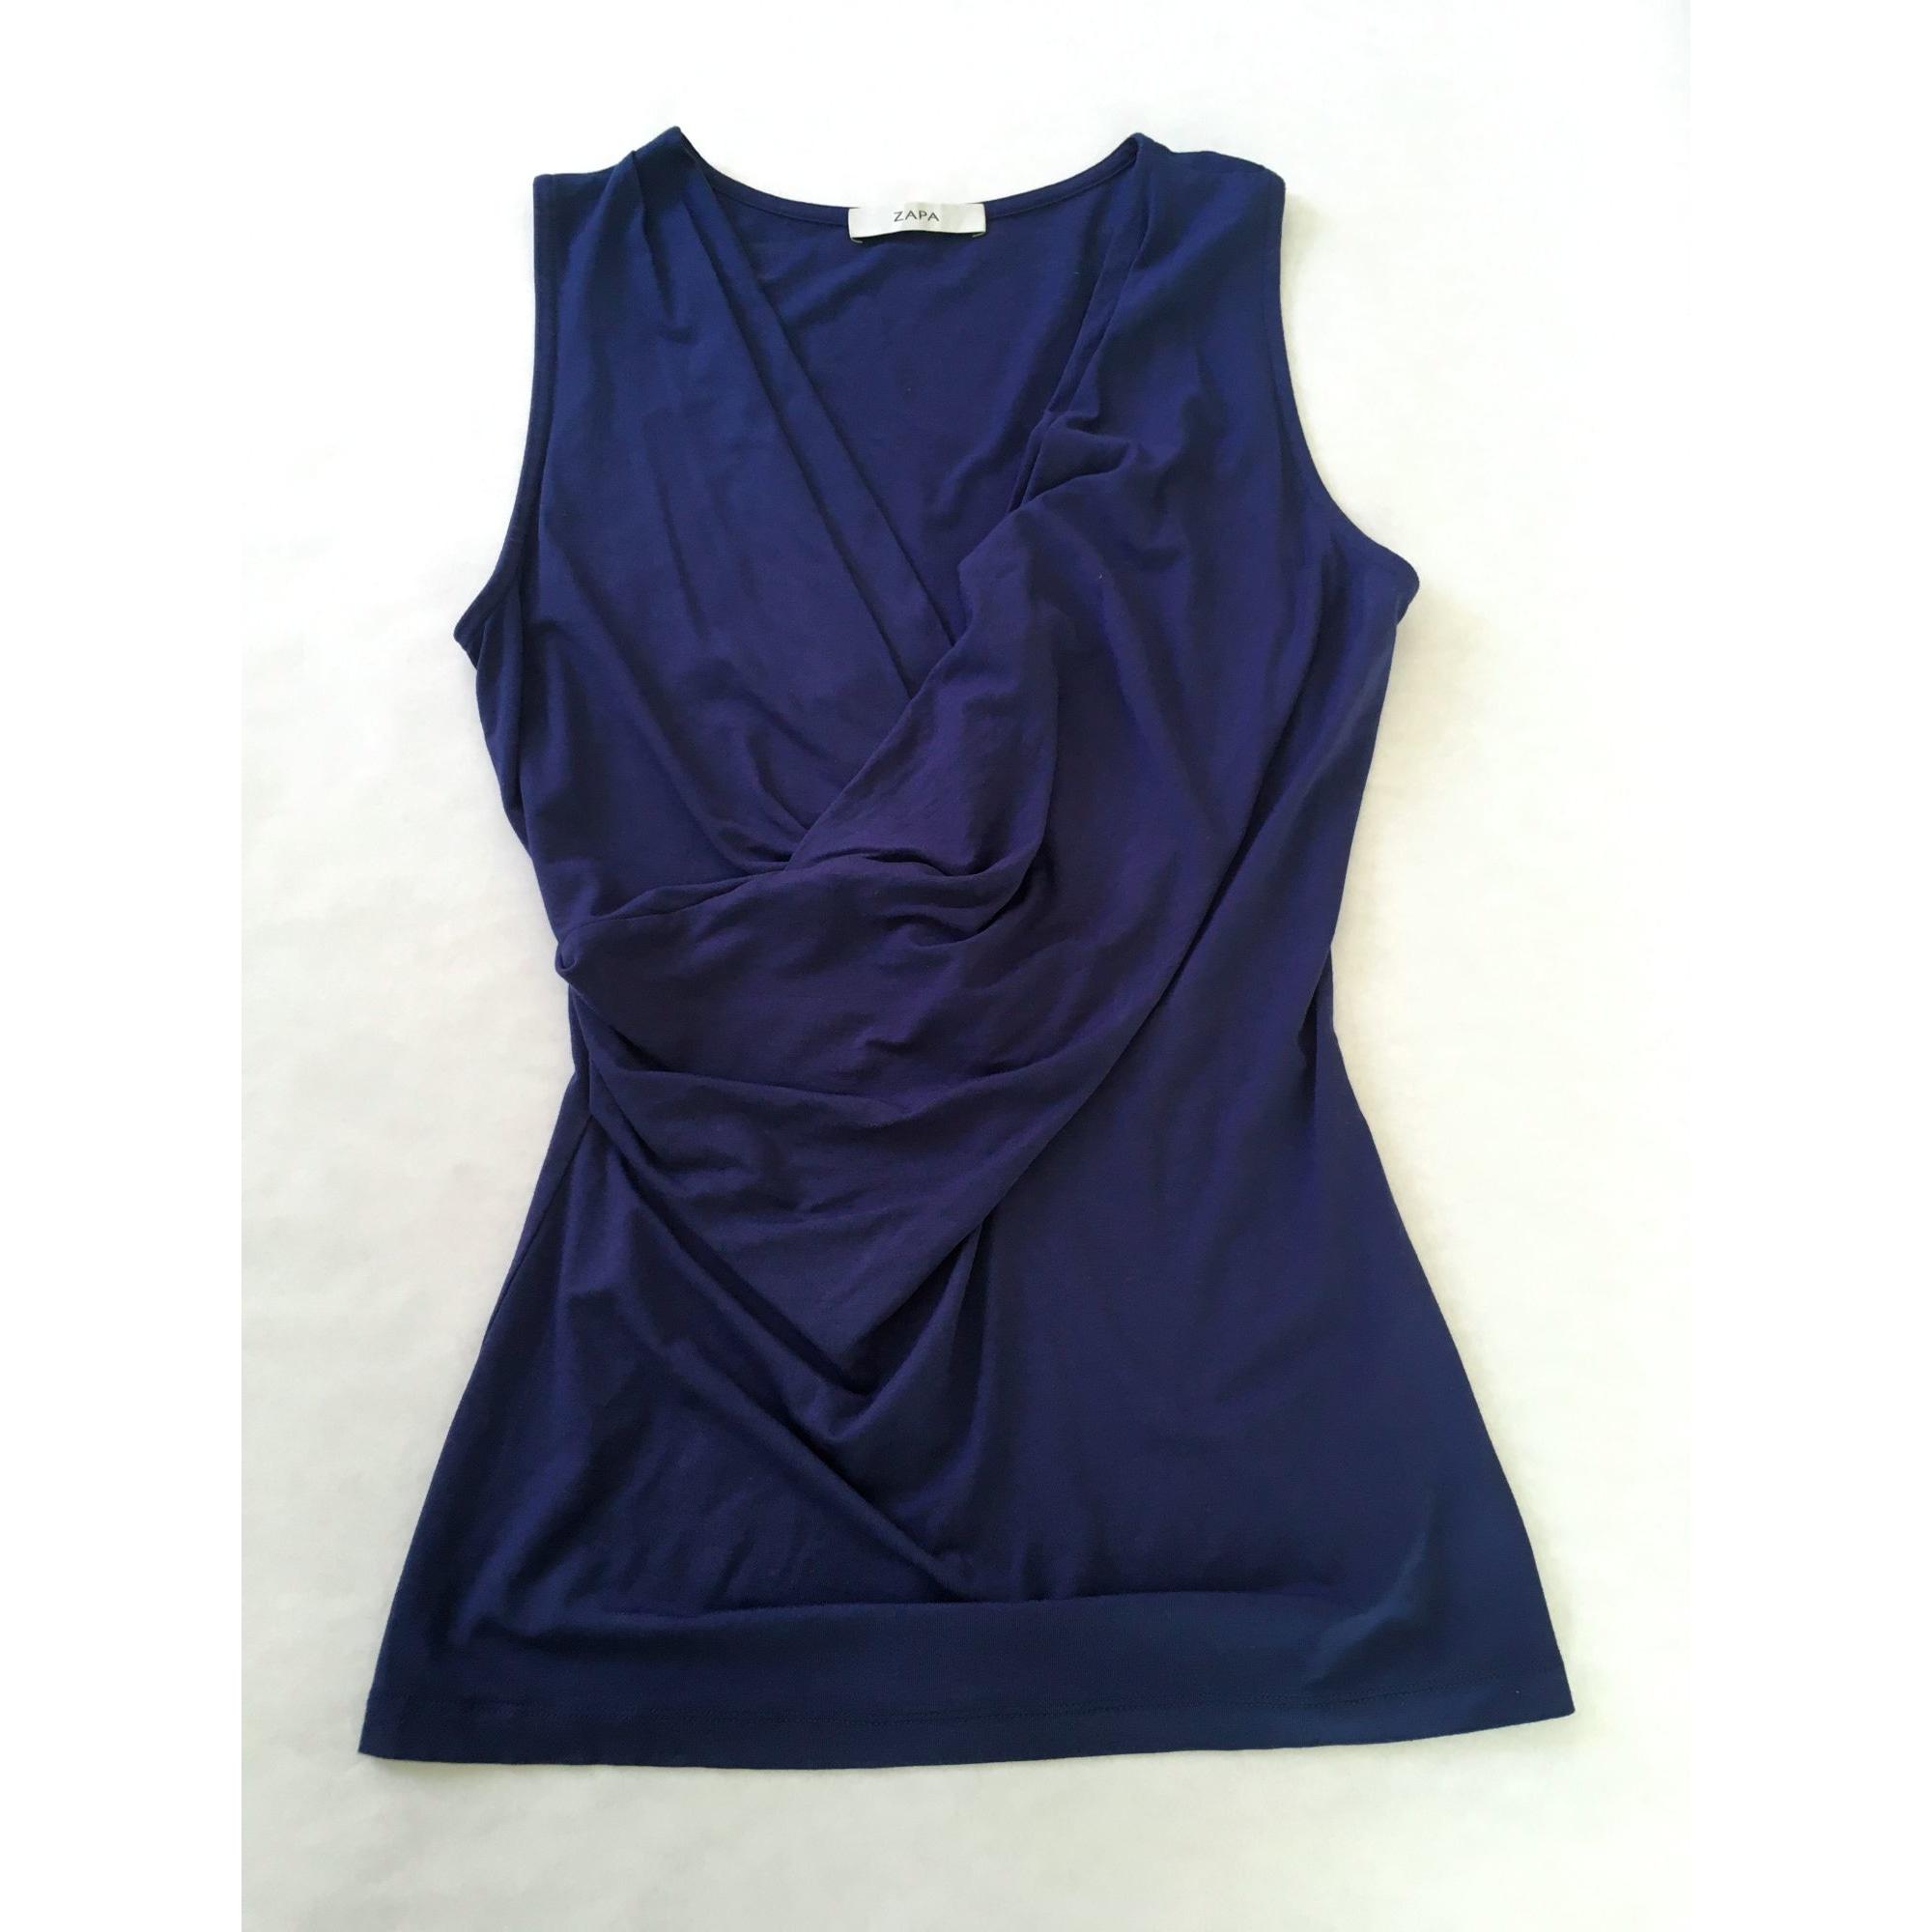 Top, tee-shirt ZAPA Bleu, bleu marine, bleu turquoise